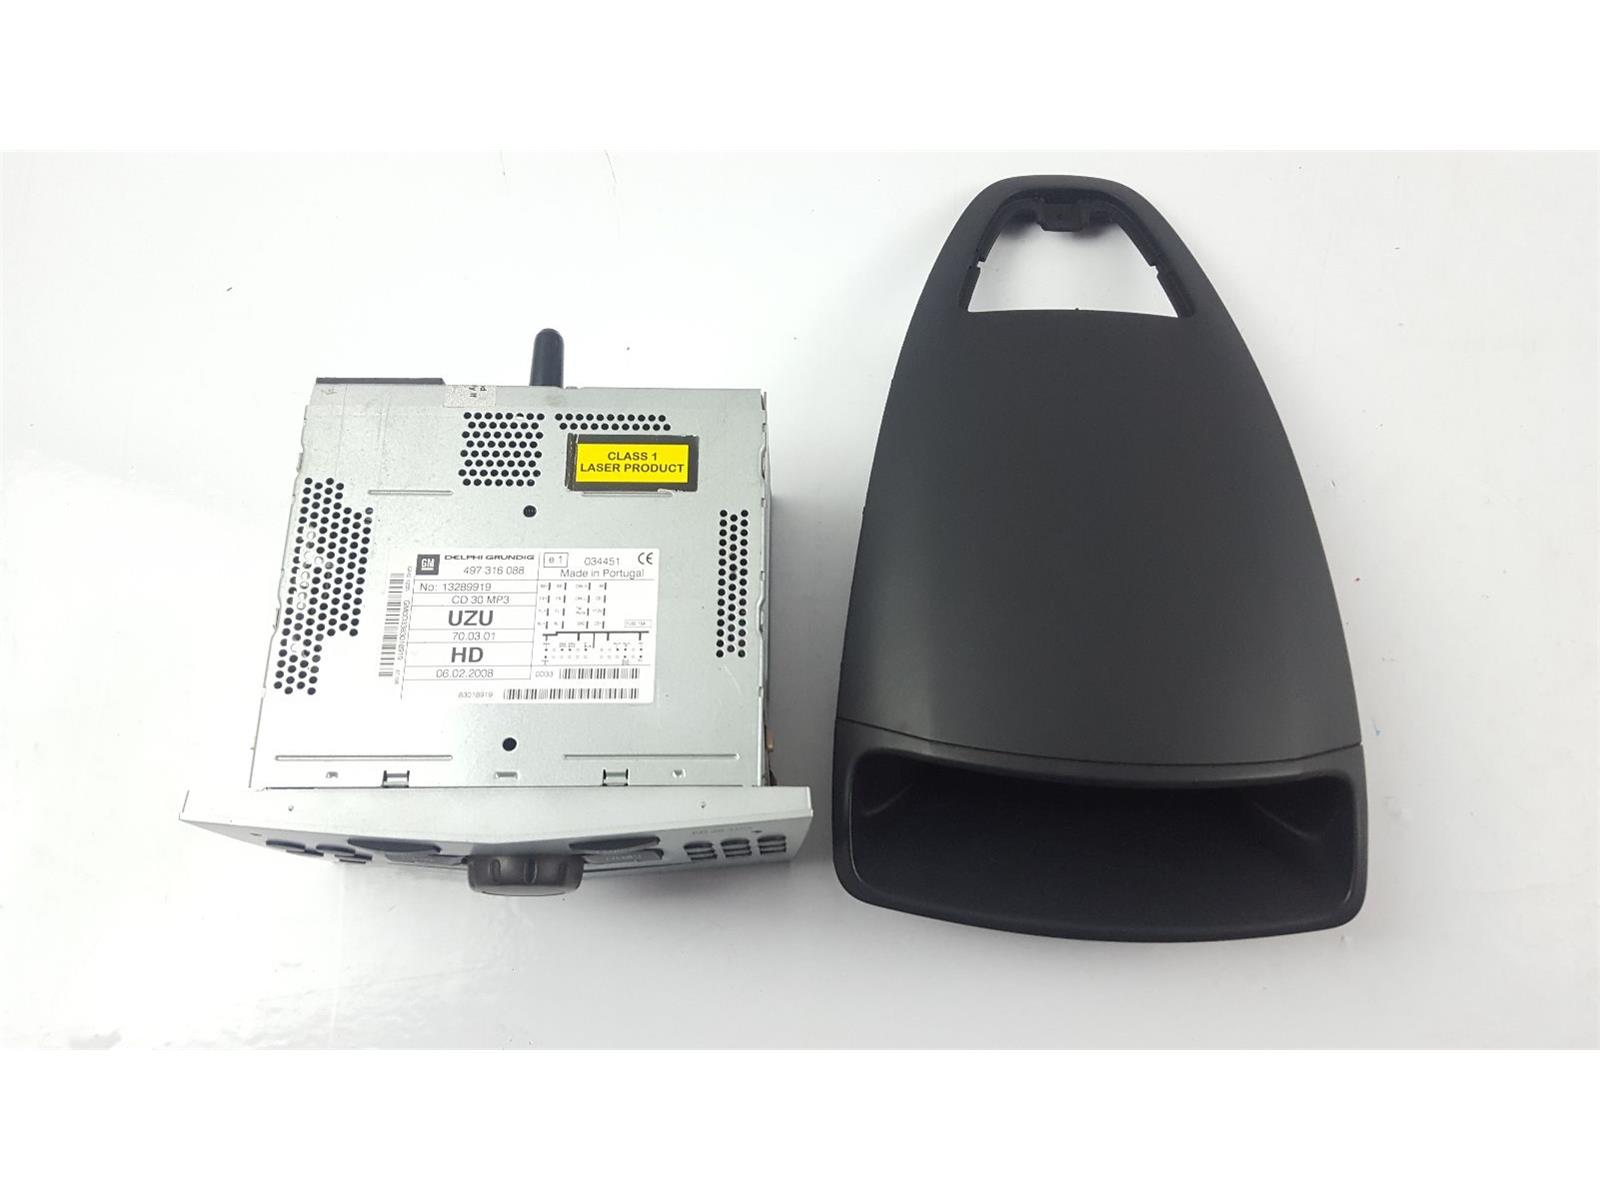 Vauxhall corsa 2007 to 2011 radio cd player petrol manual for mk3 vauxhall corsa d radio cd player cd30 mp3 13289919 13284430 sciox Images